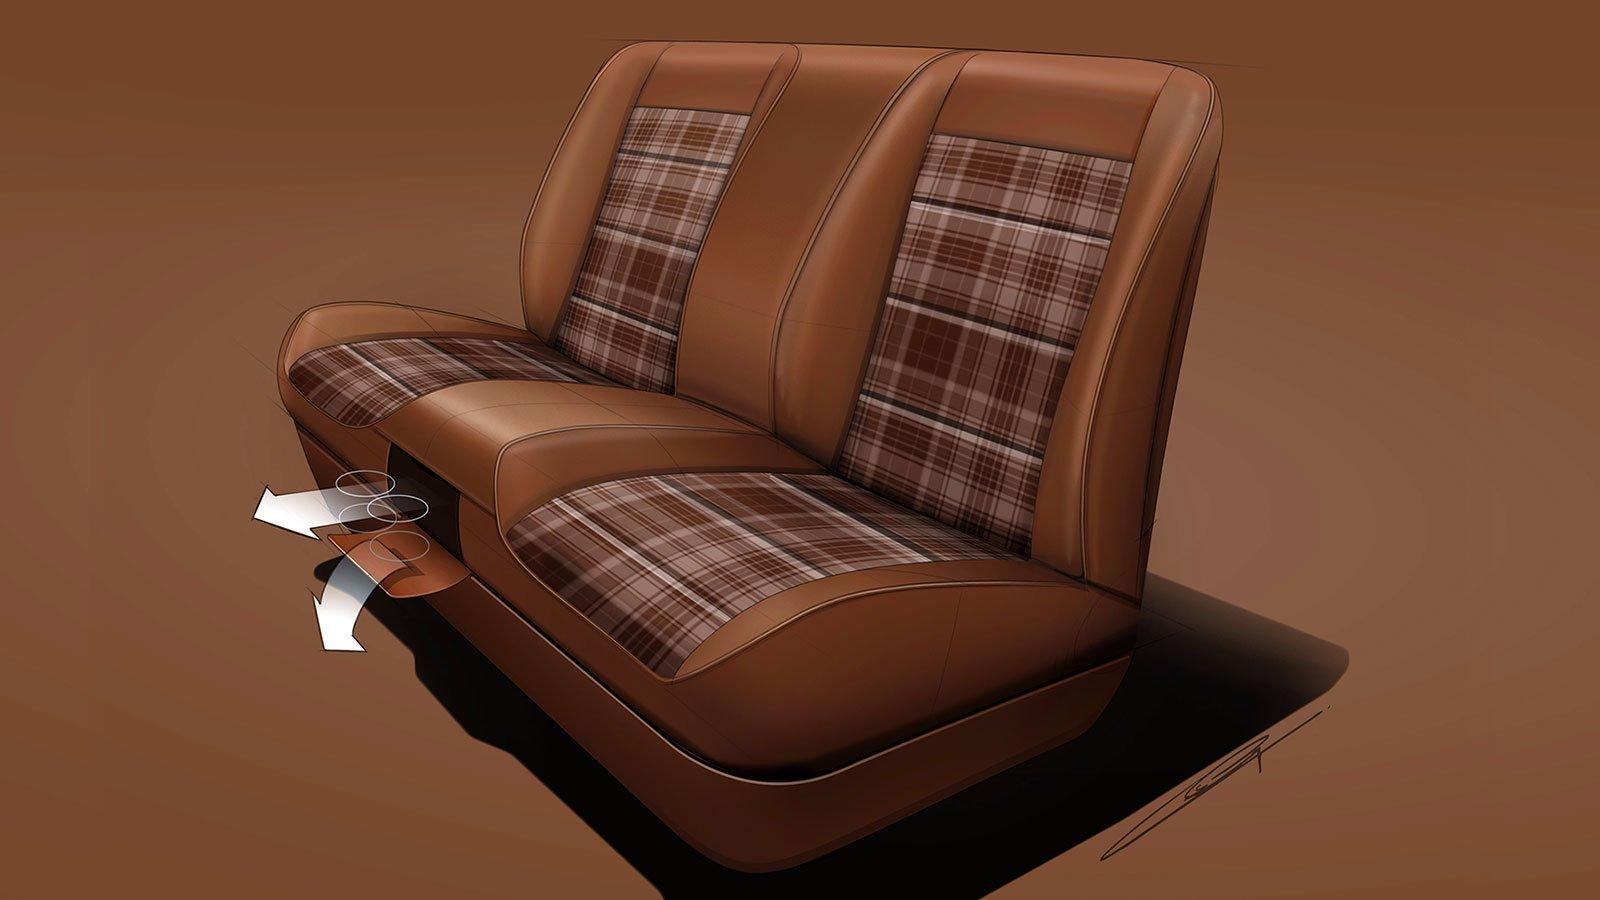 interior-bench-seat-concept